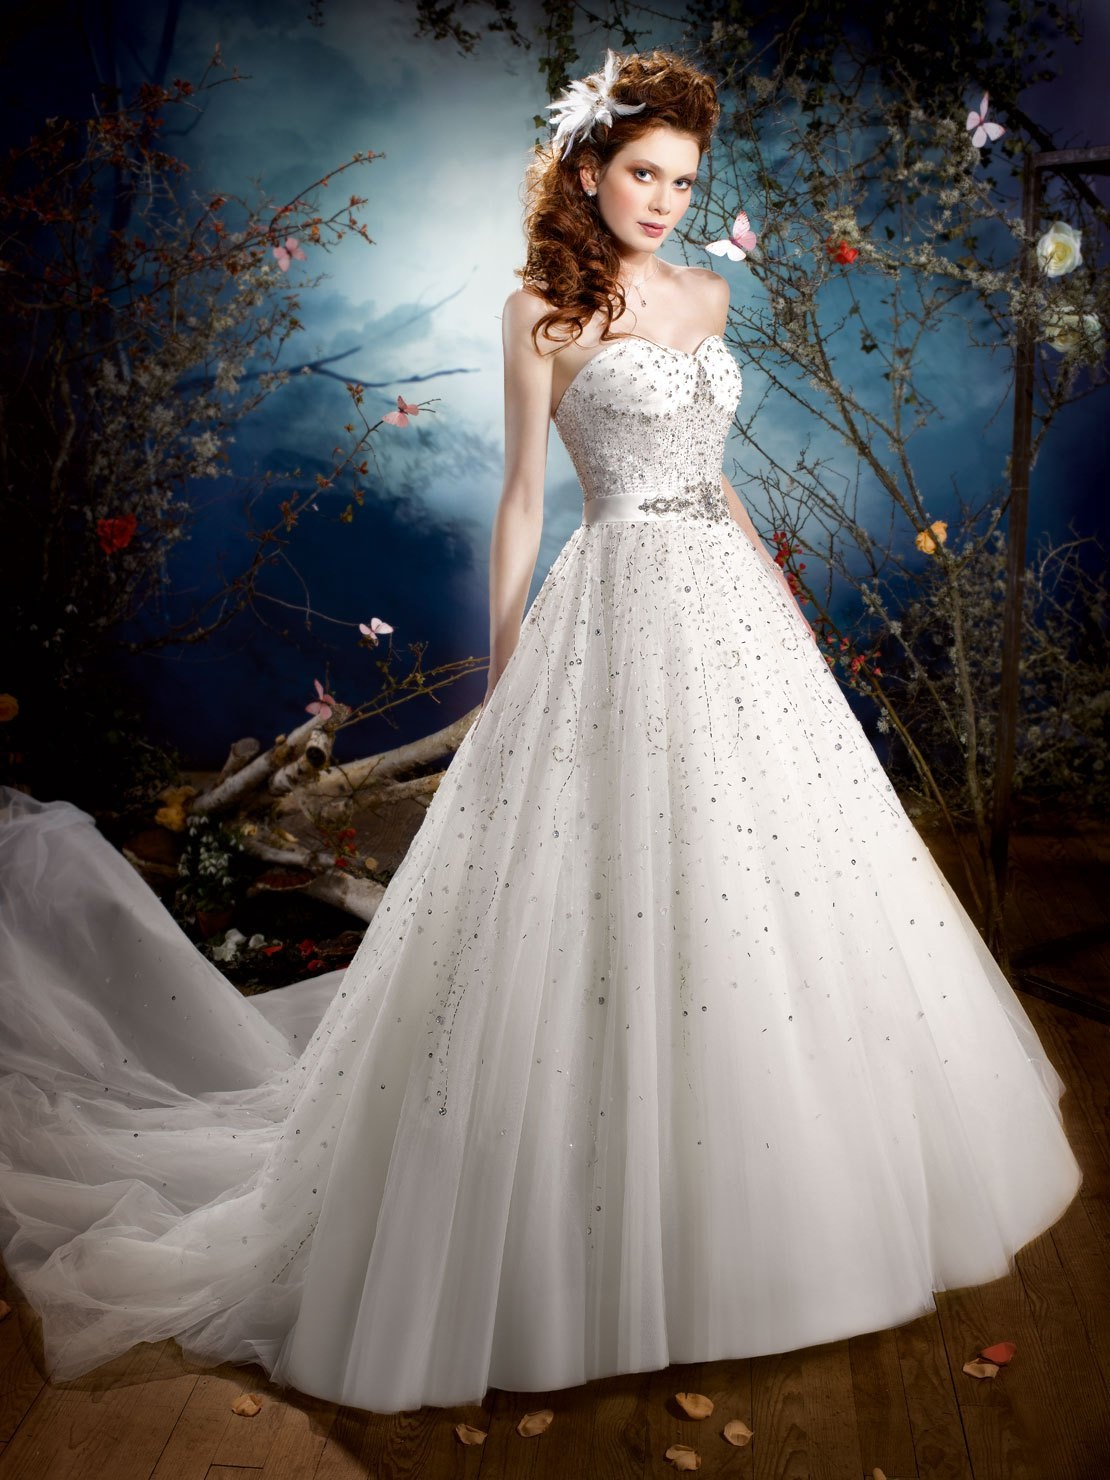 Kelly Star 2013 Spring Bridal Wedding Dresses